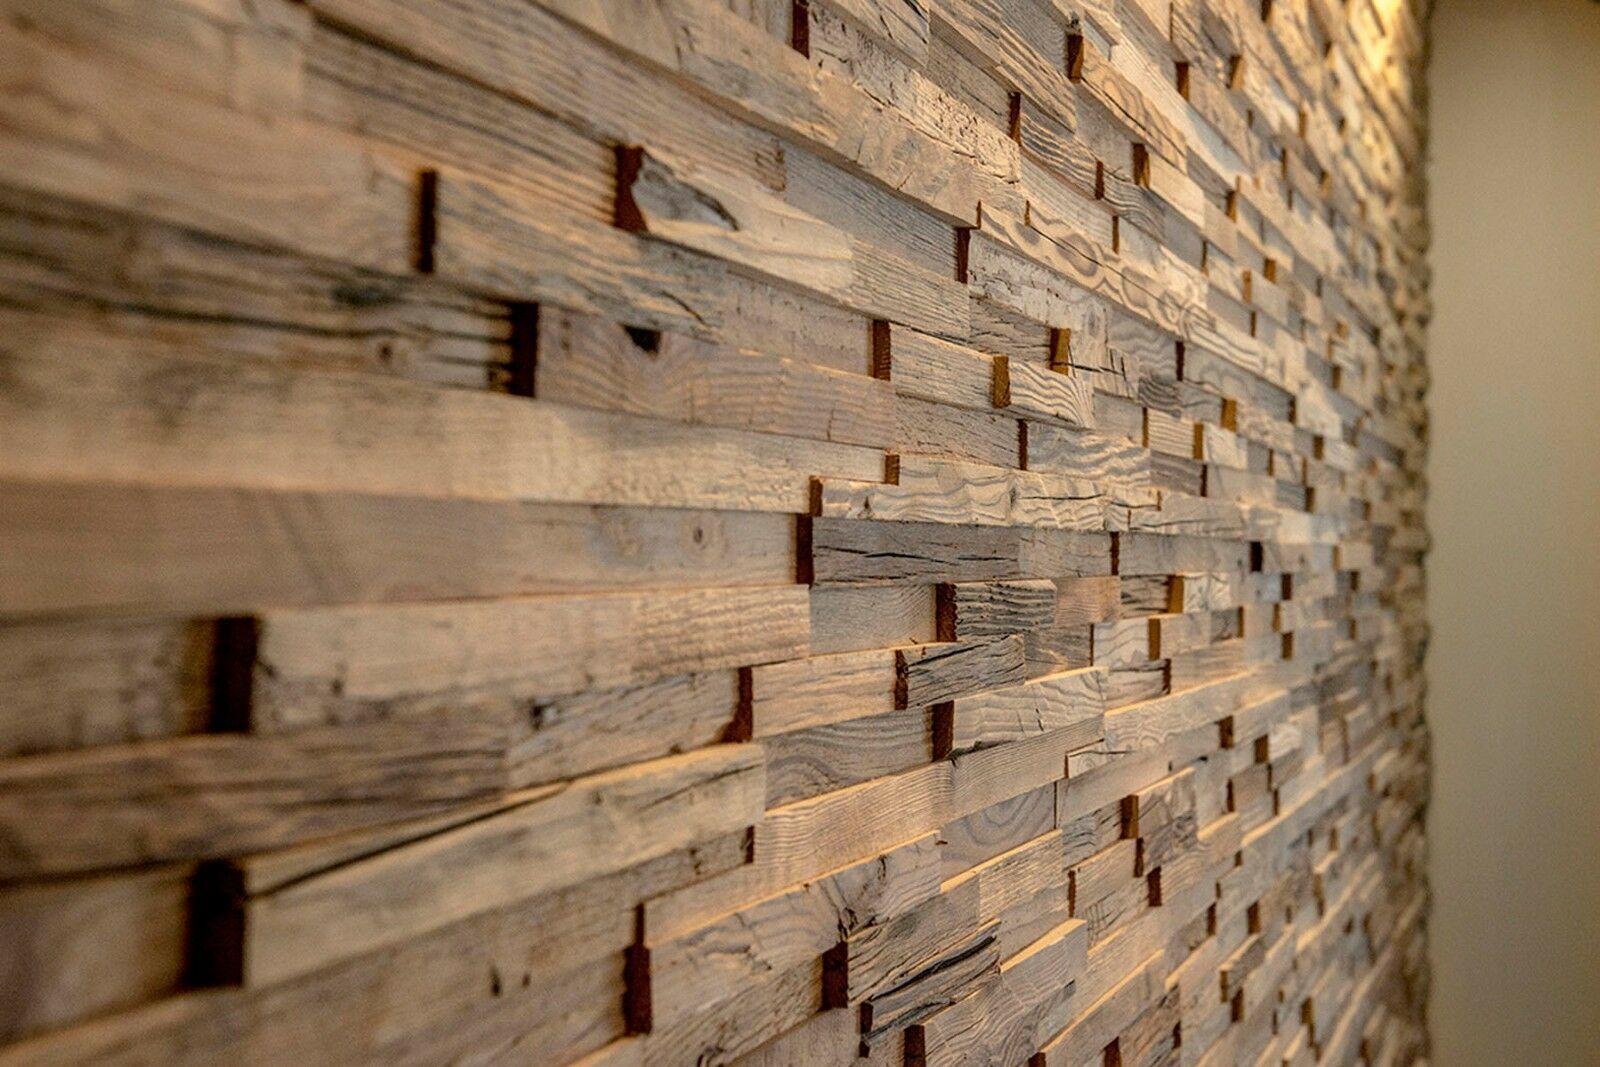 Https Www Ebay De Itm Holzpaneele Wandverkleidung Holz Wandpaneele Holzwand Holzverblender Apriori 232233296307 Wandverkleidung Holz Holzpaneele Holzwand